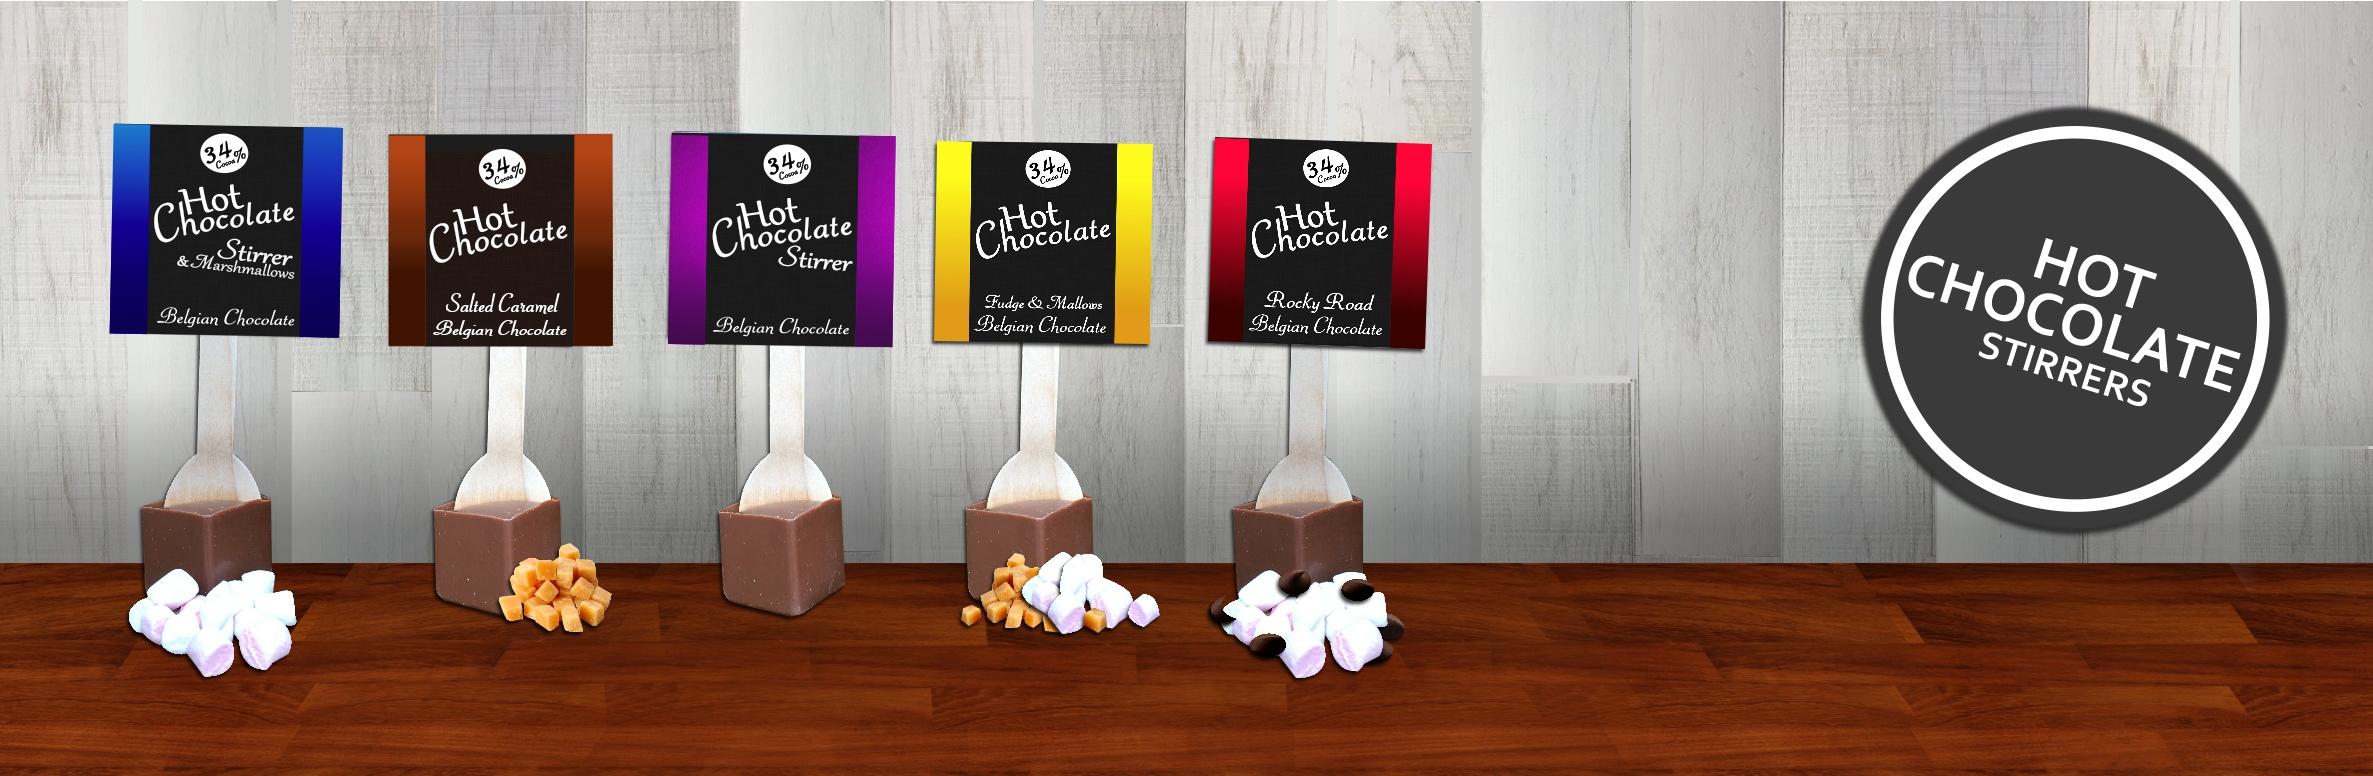 hot chocolate stirrers, hot chocolate spoons, chocolate stirrers, hot chocolate sticks, choc o lait